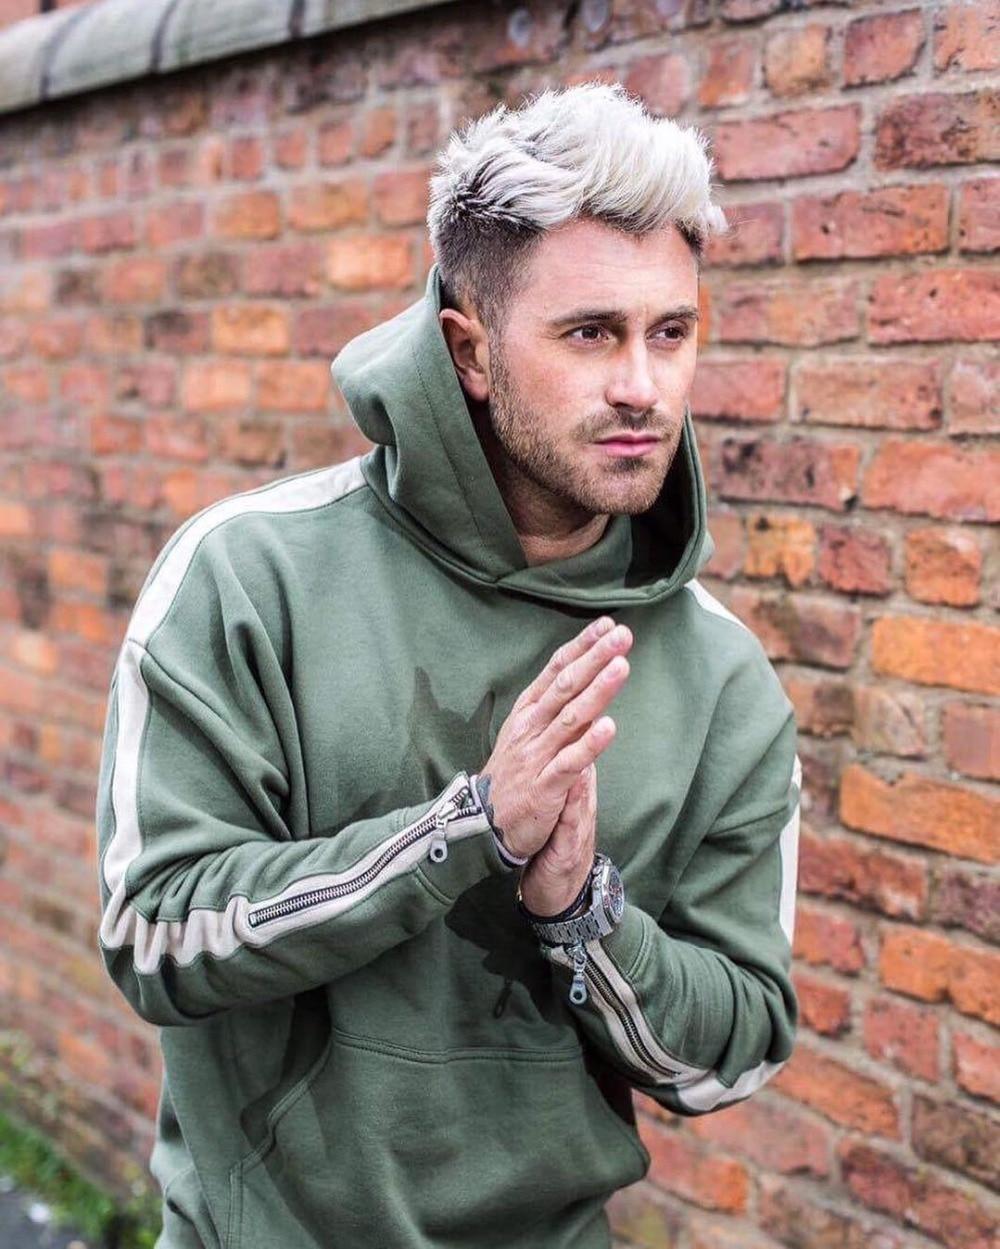 HIPFANDI 2017 New Men Brand Zippe Side Splice Hoodies Zipped Sleeve Pullovers Hoodies High Street Black/Green/Khaki Sweatshirts